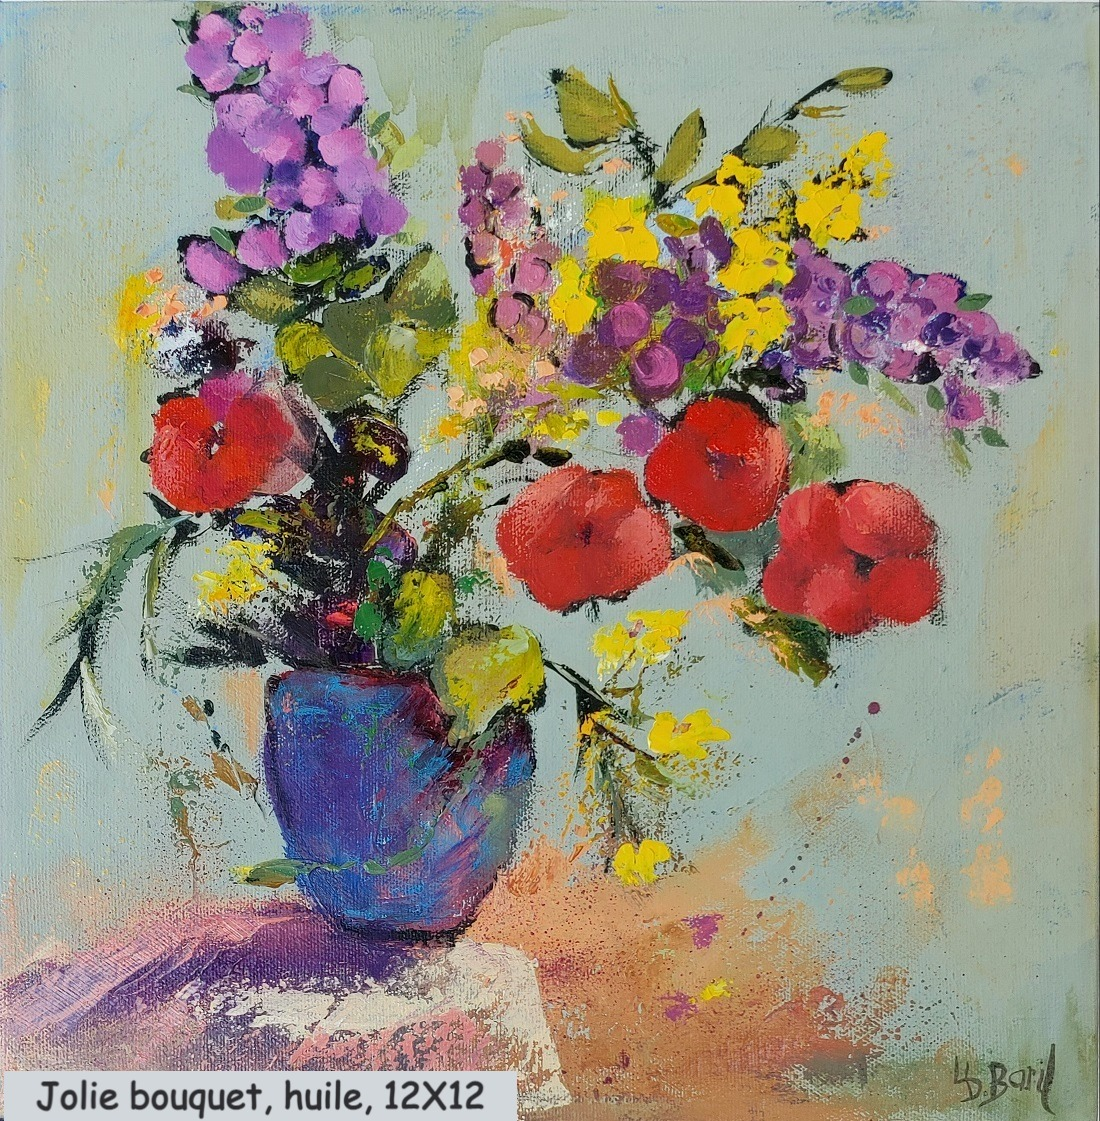 Joli bouquet, huile, 12X12